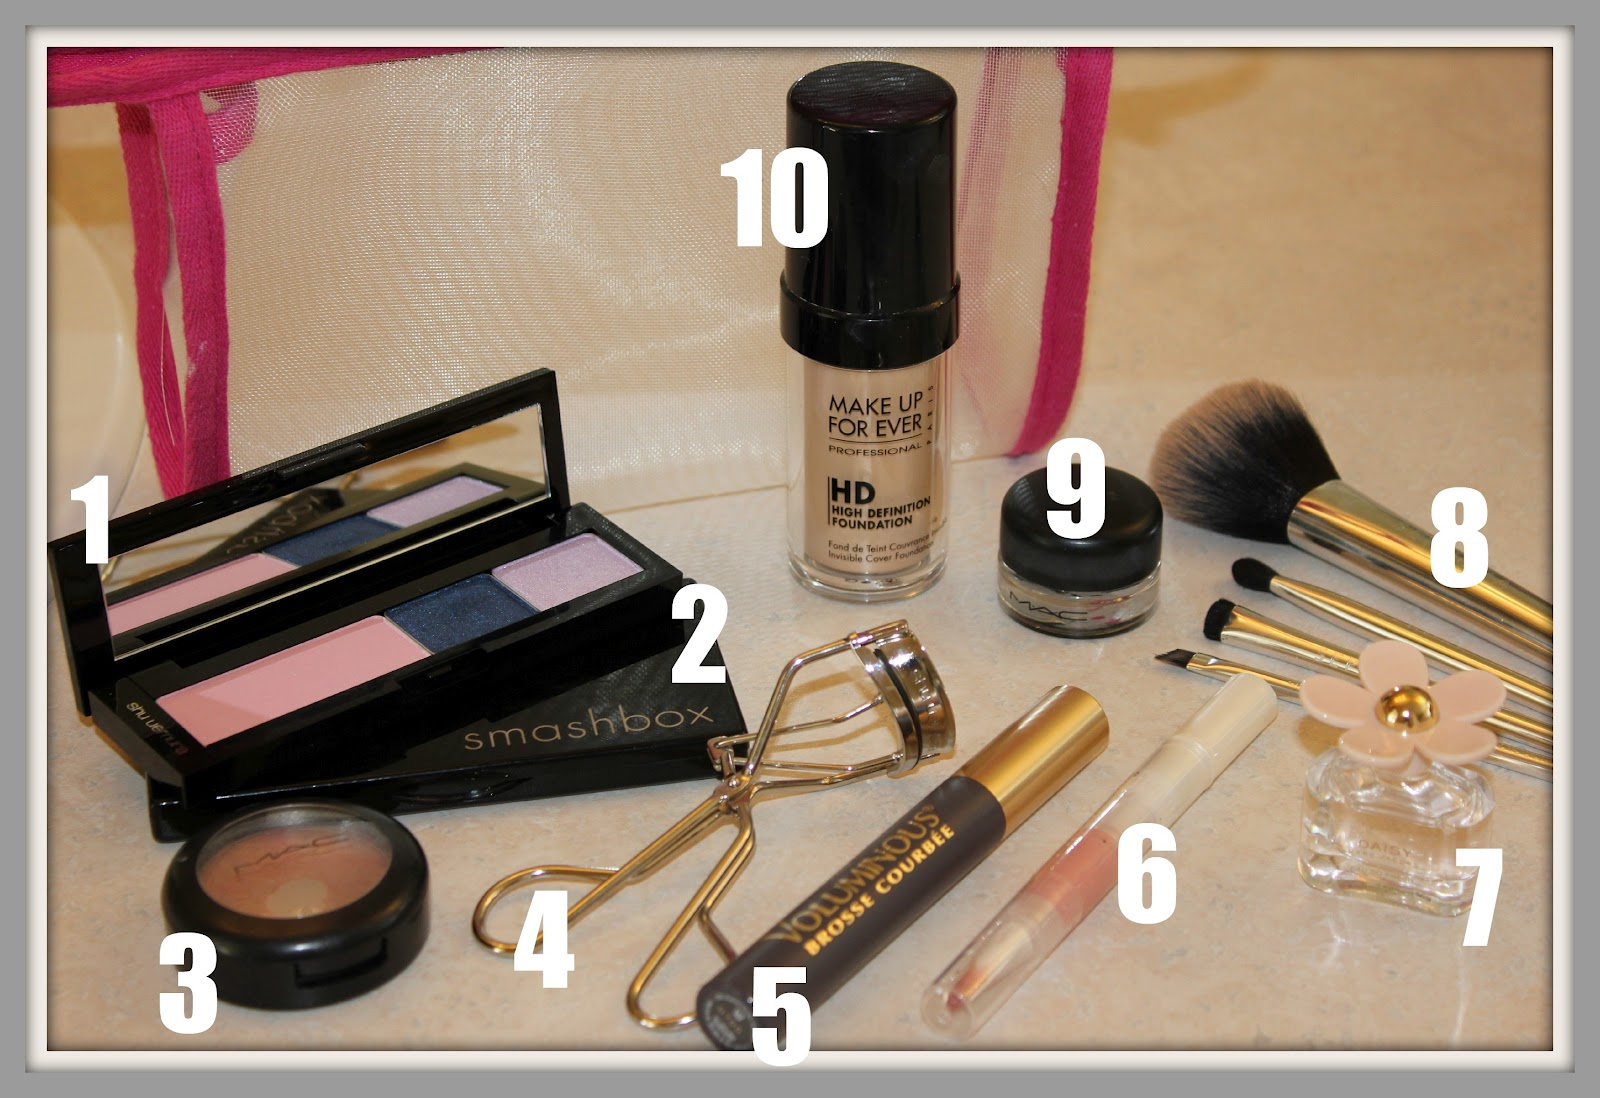 blushing basics: How to Pack a Makeup Travel Kit